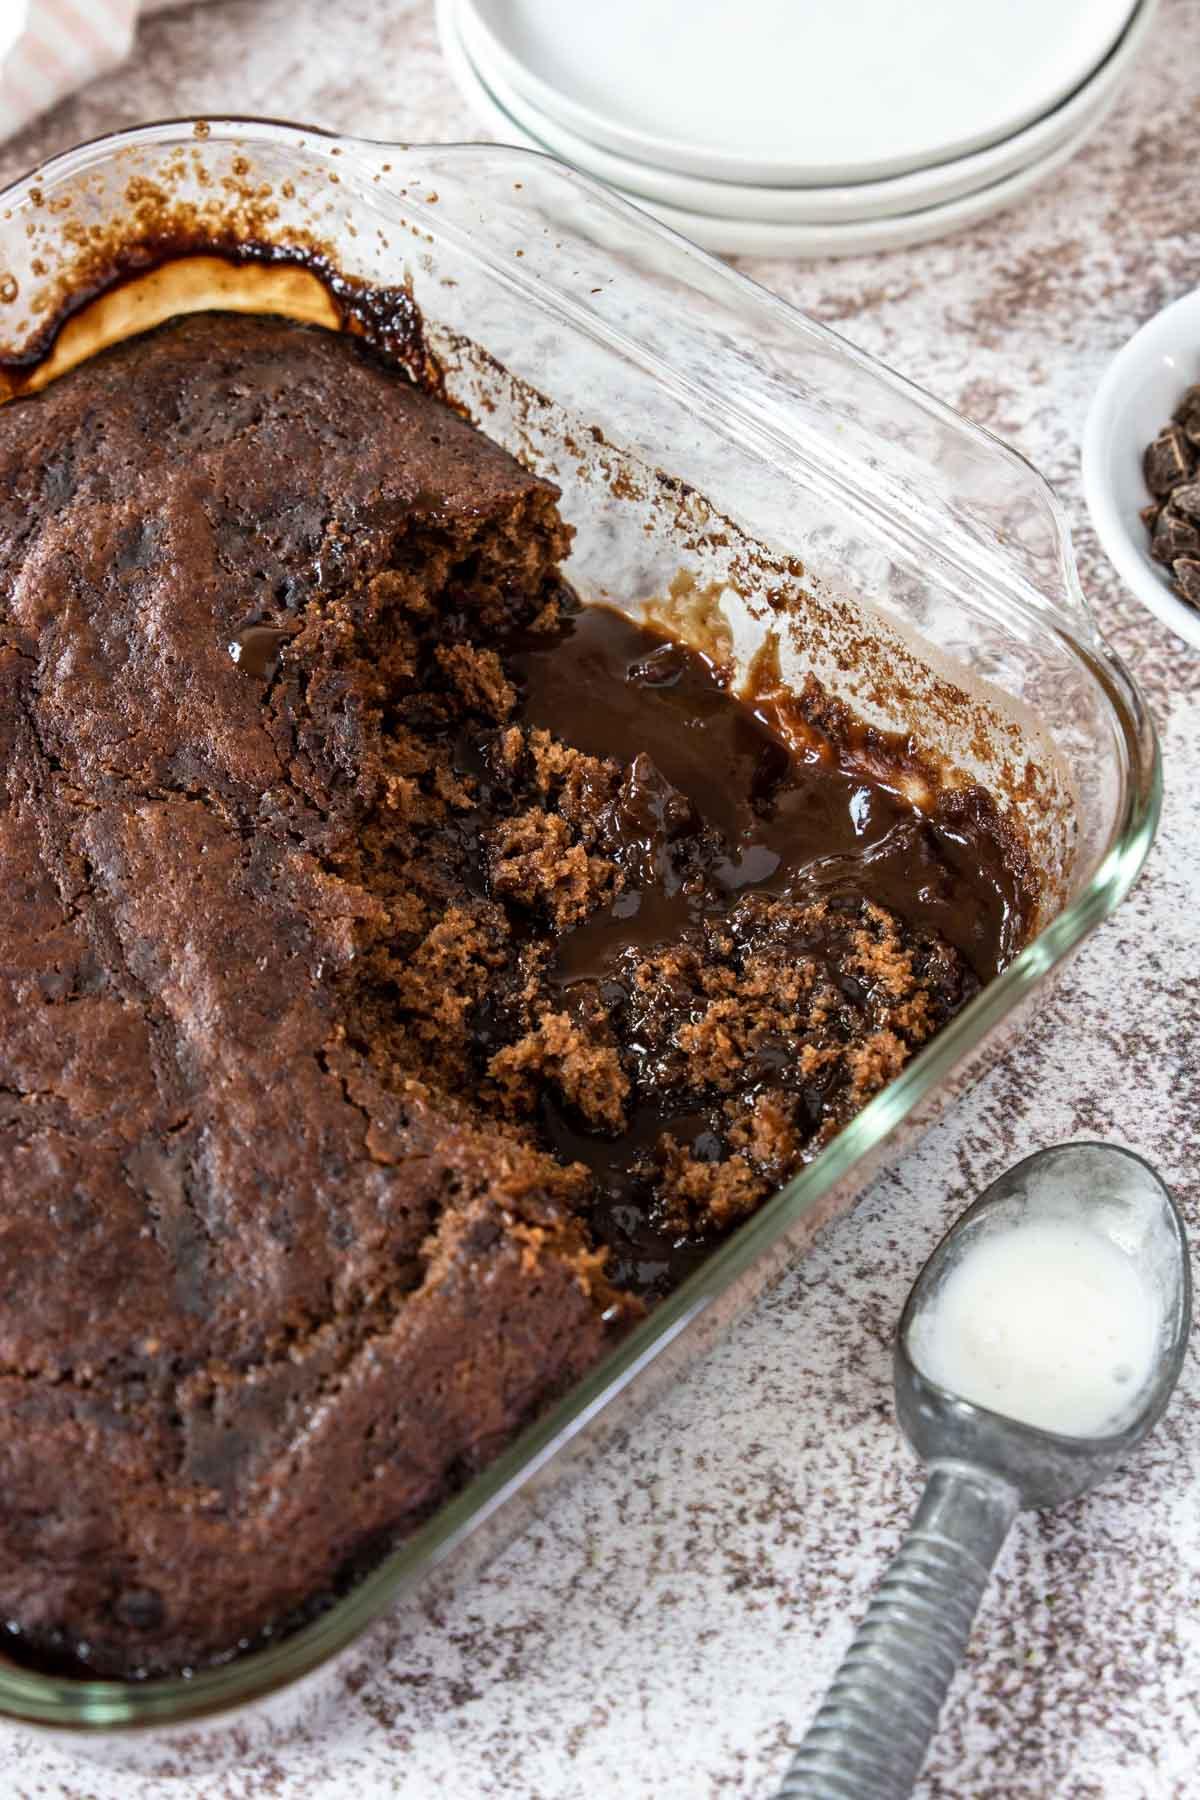 hot fudge chocolate pudding cake in an 8x8 pan